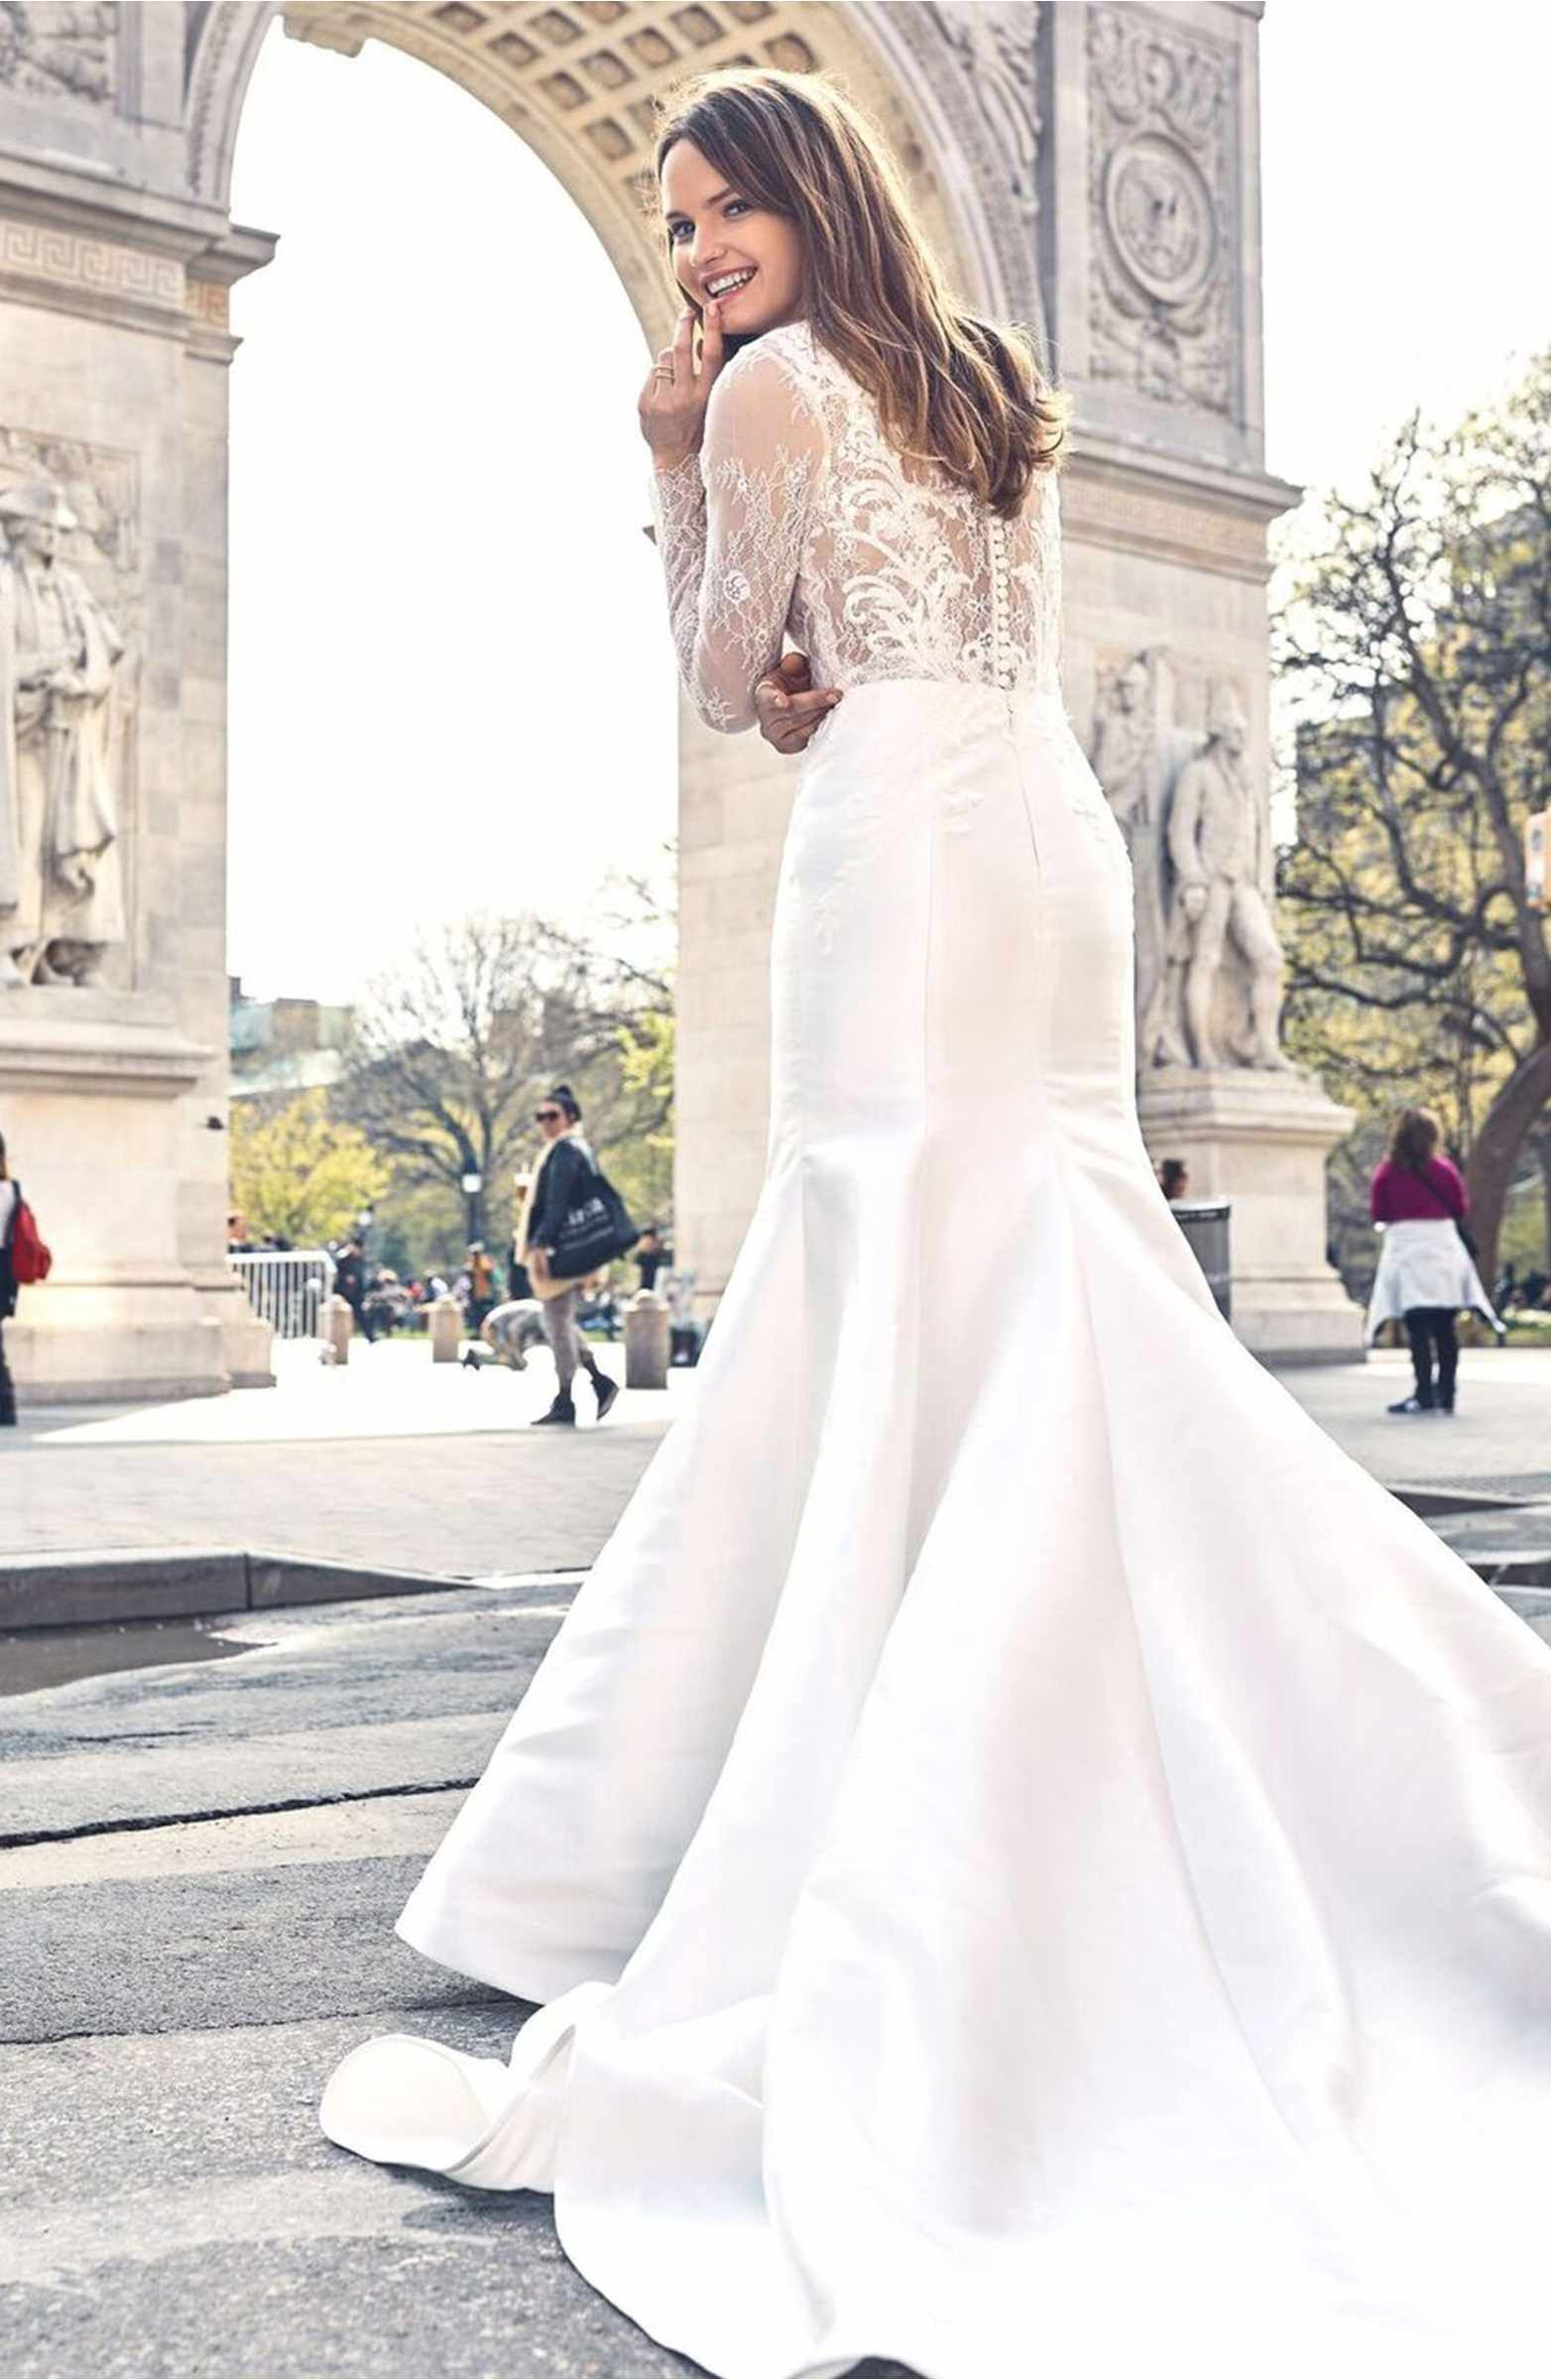 Main Image Bliss Monique Lhuillier V Neck Lace Mikado Mermaid Gown 3400 Top Wedding Dresses Long Sleeve Wedding Dress Lace Mermaid Wedding Dress Trends